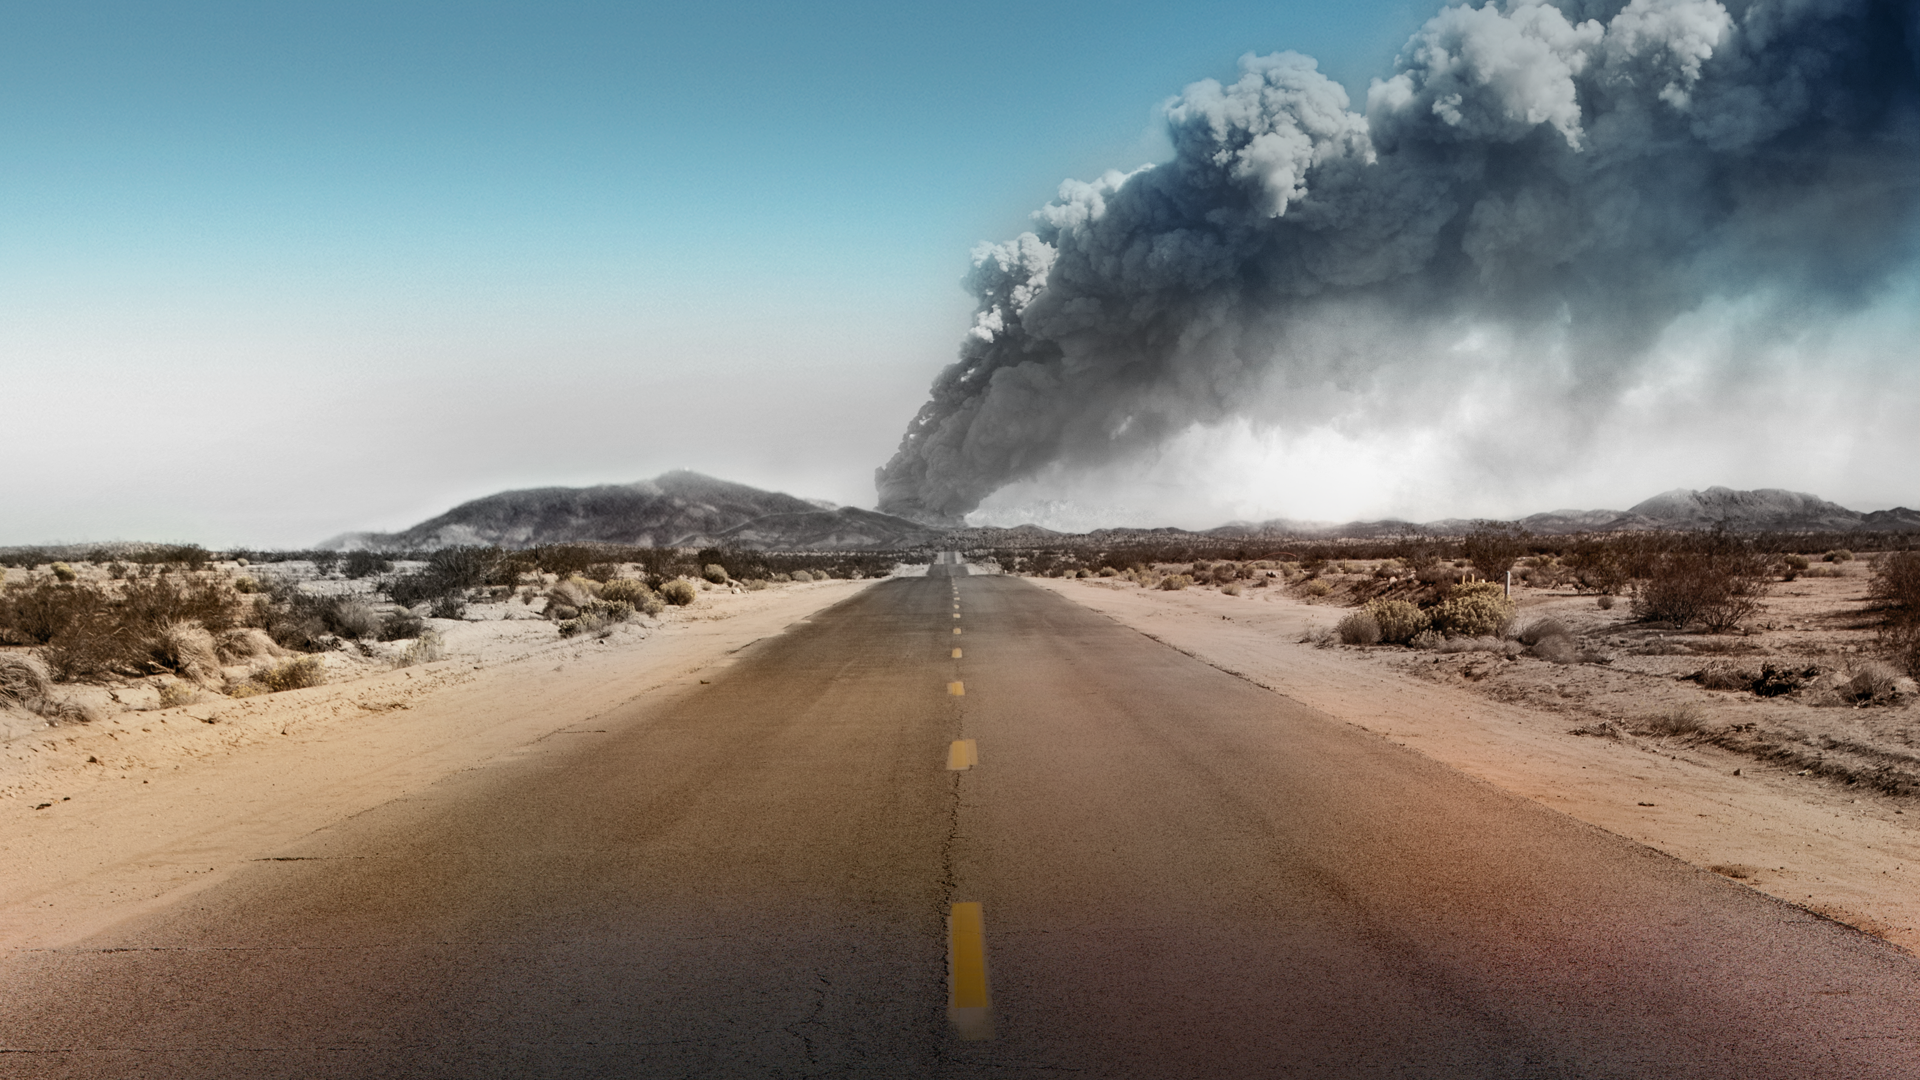 Diani & Devine Meet the Apocalypse